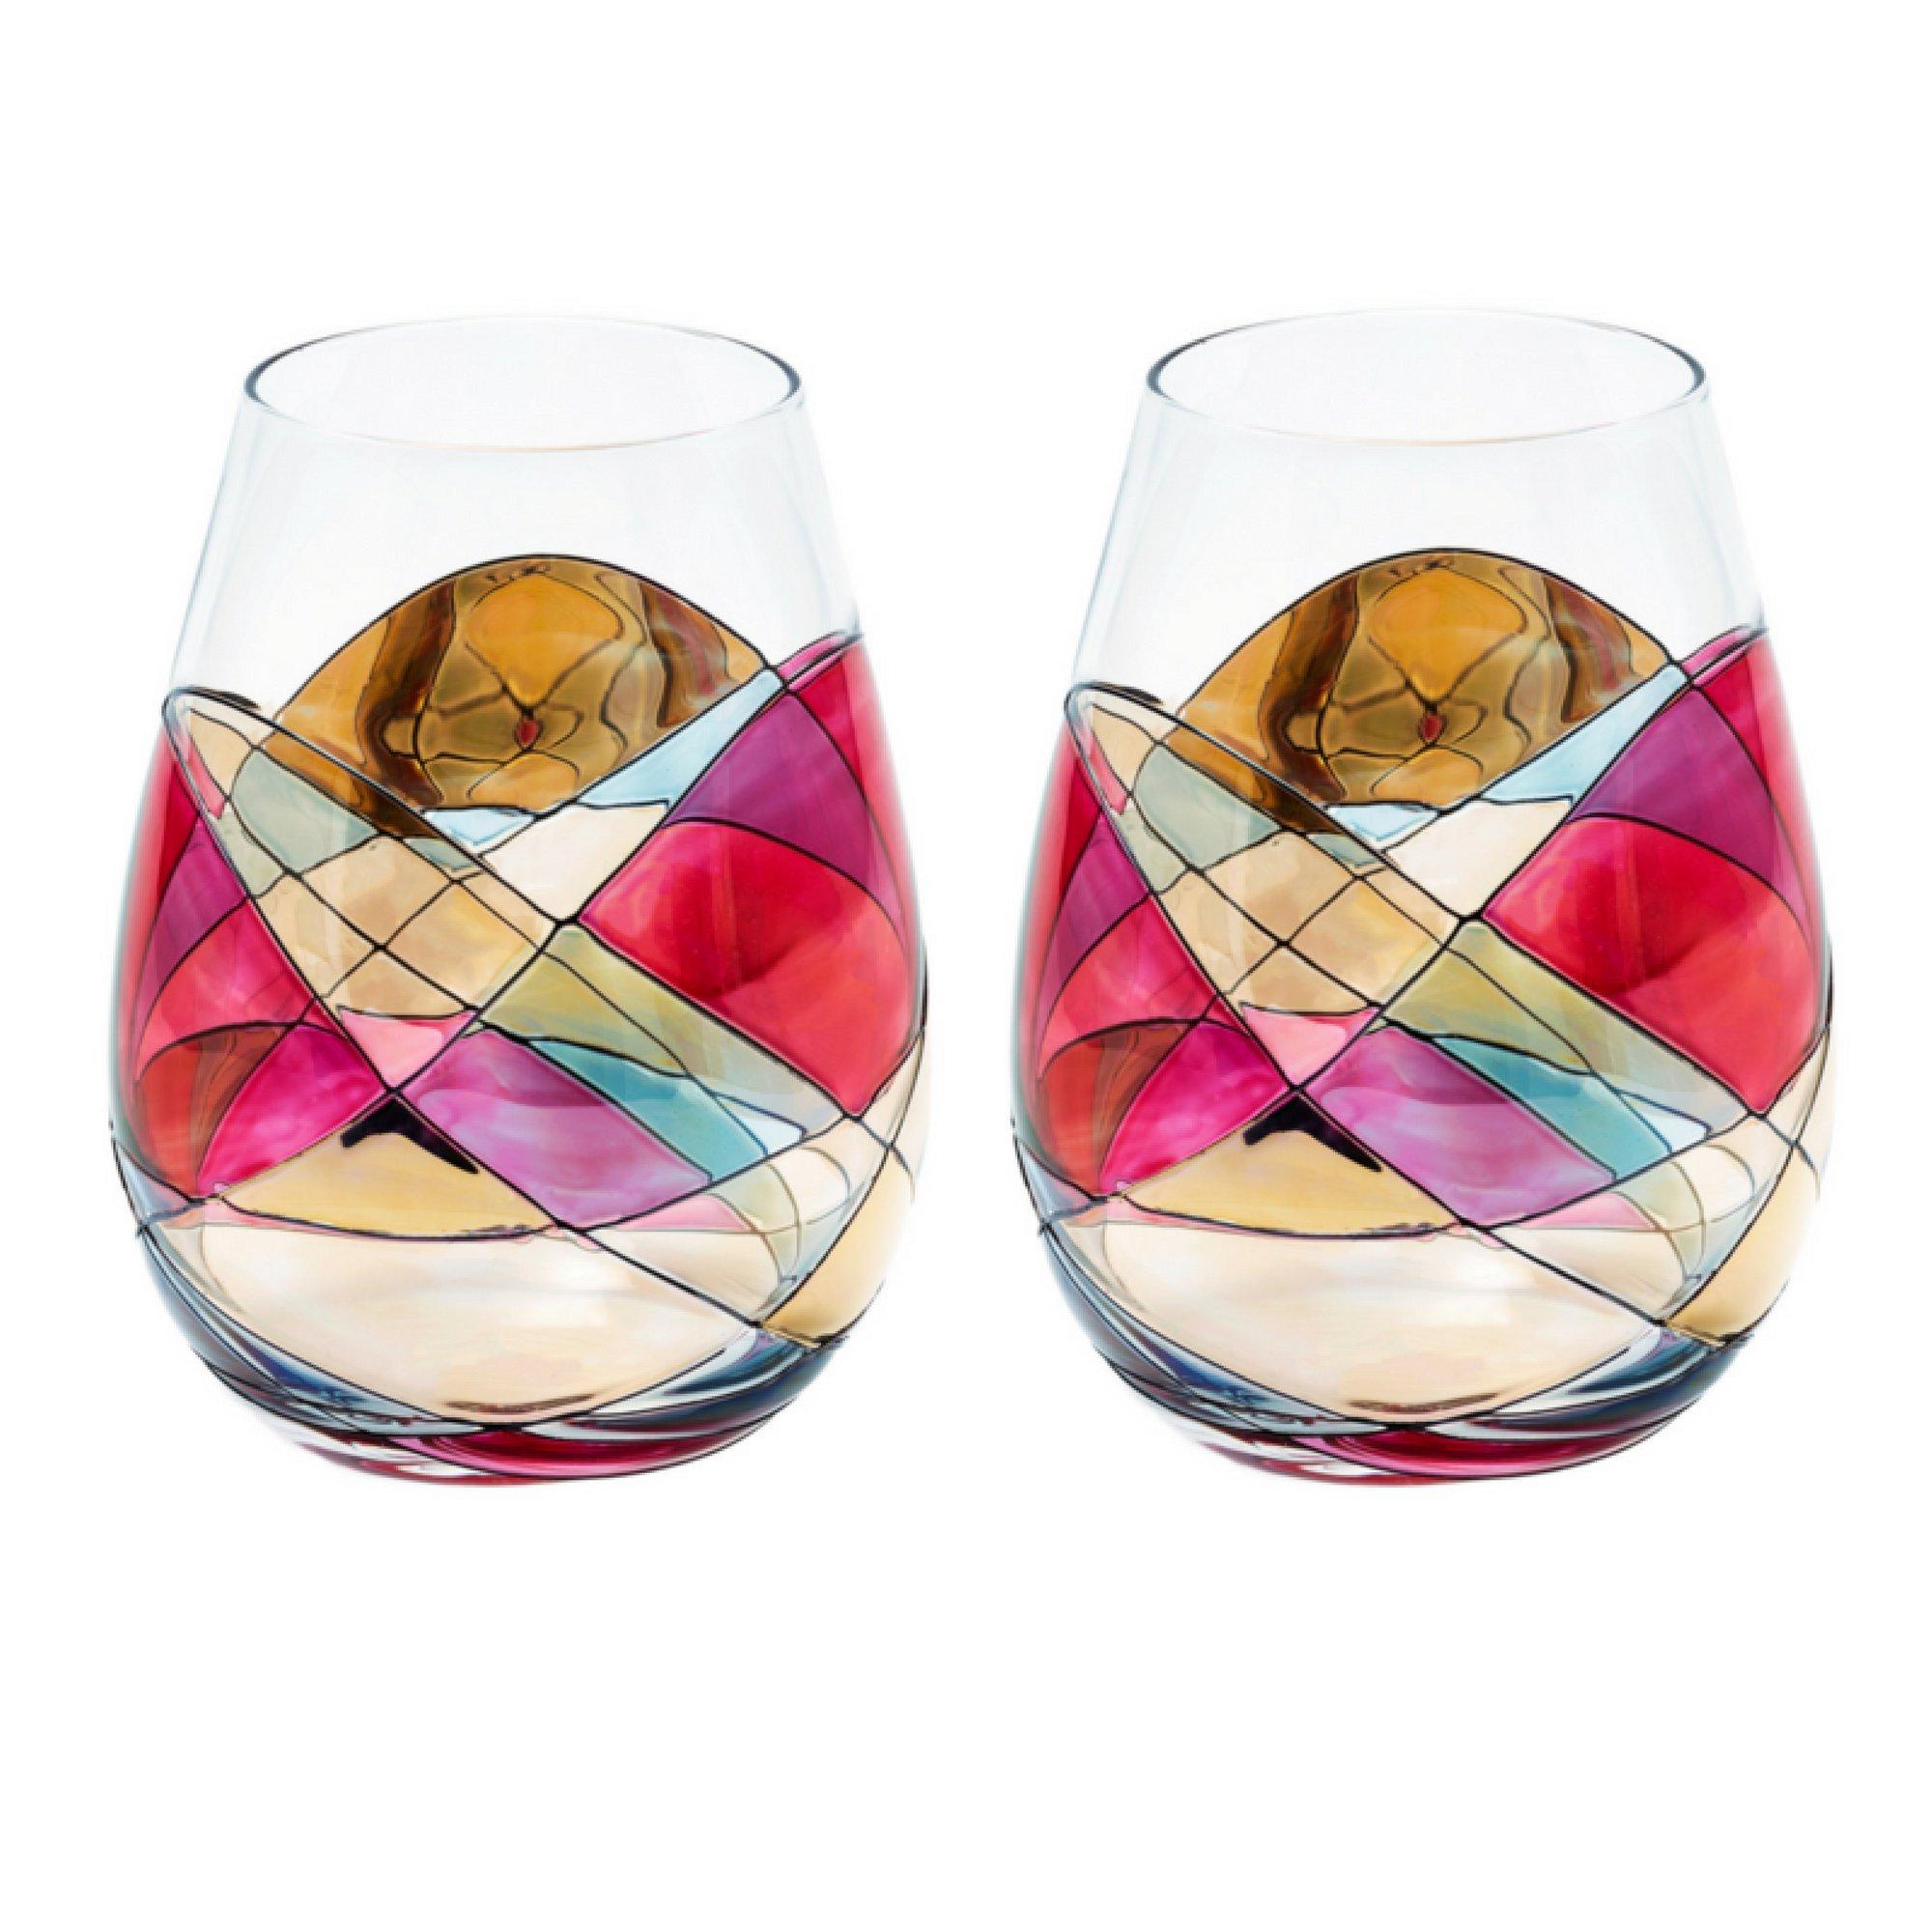 ANTONI BARCELONA Stemless Wine Glasses Set of 2 (21 Oz) - Handblown & Handmade, Painted Red Wine Glass, Gifts for Women, Birthdays, Anniversaries, and Weddings - 2 Units by ANTONI BARCELONA